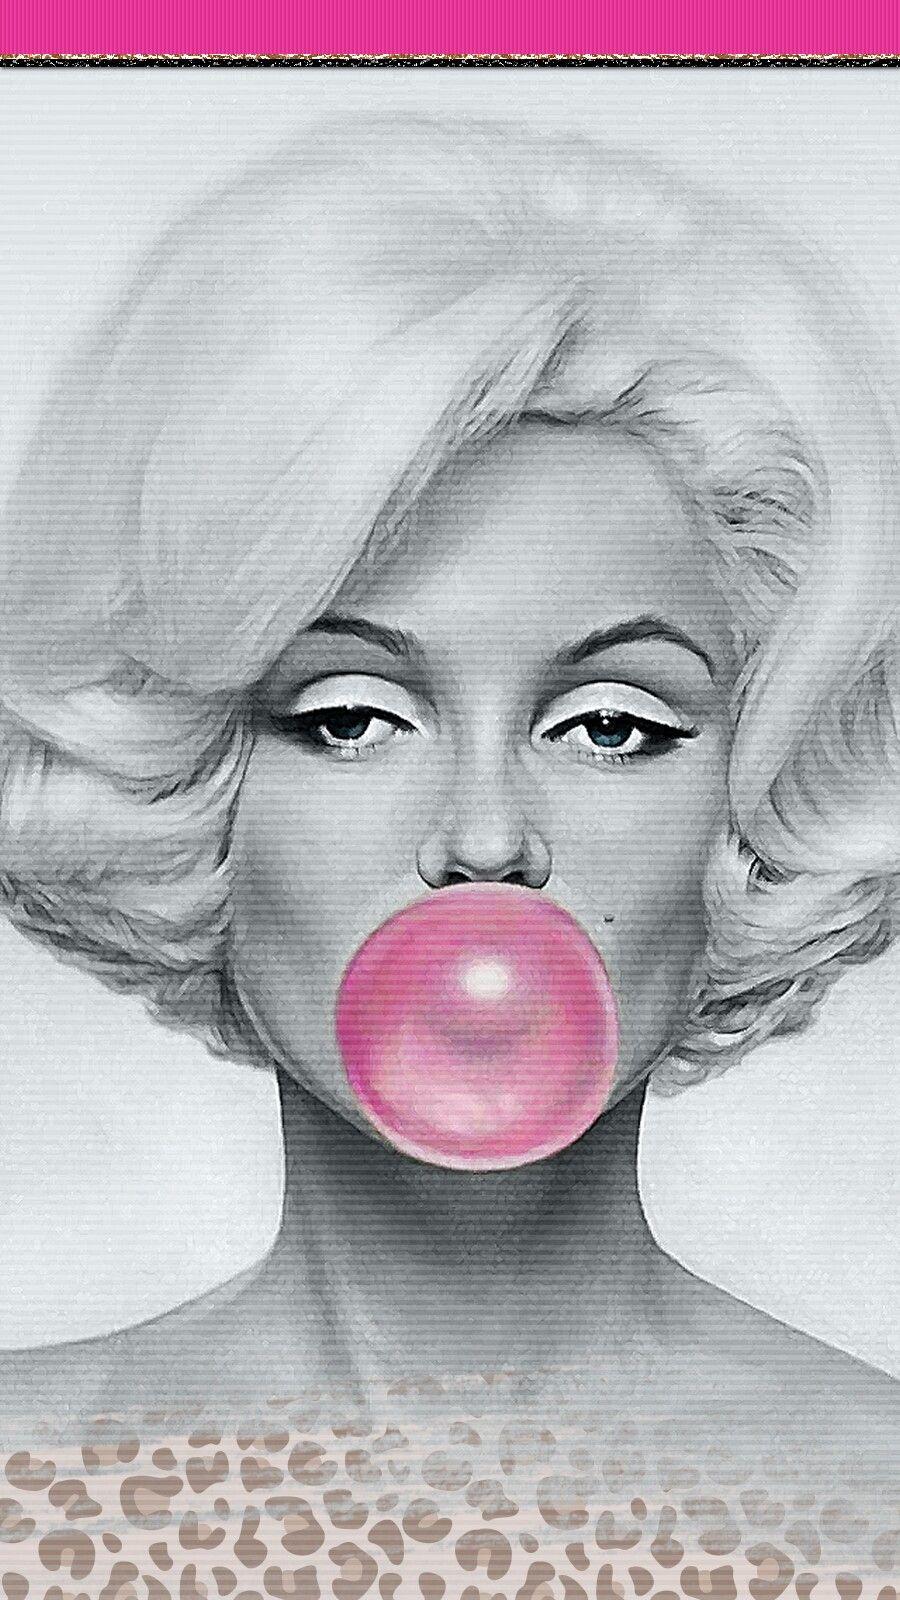 Digitalcutewalls Iphone Wallpaper Girly Marilyn Monroe